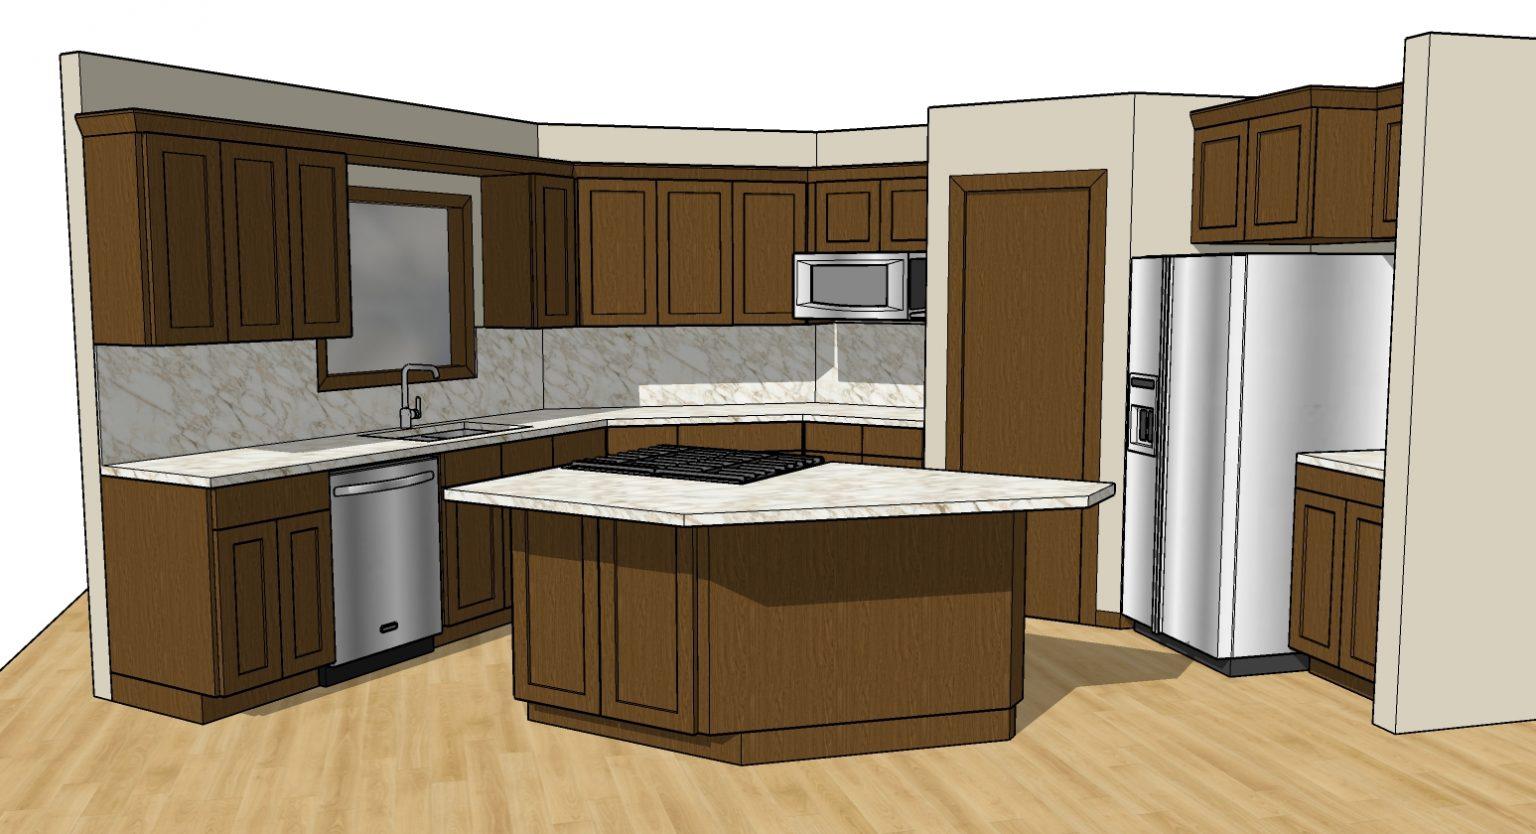 3d model interior design kitchen